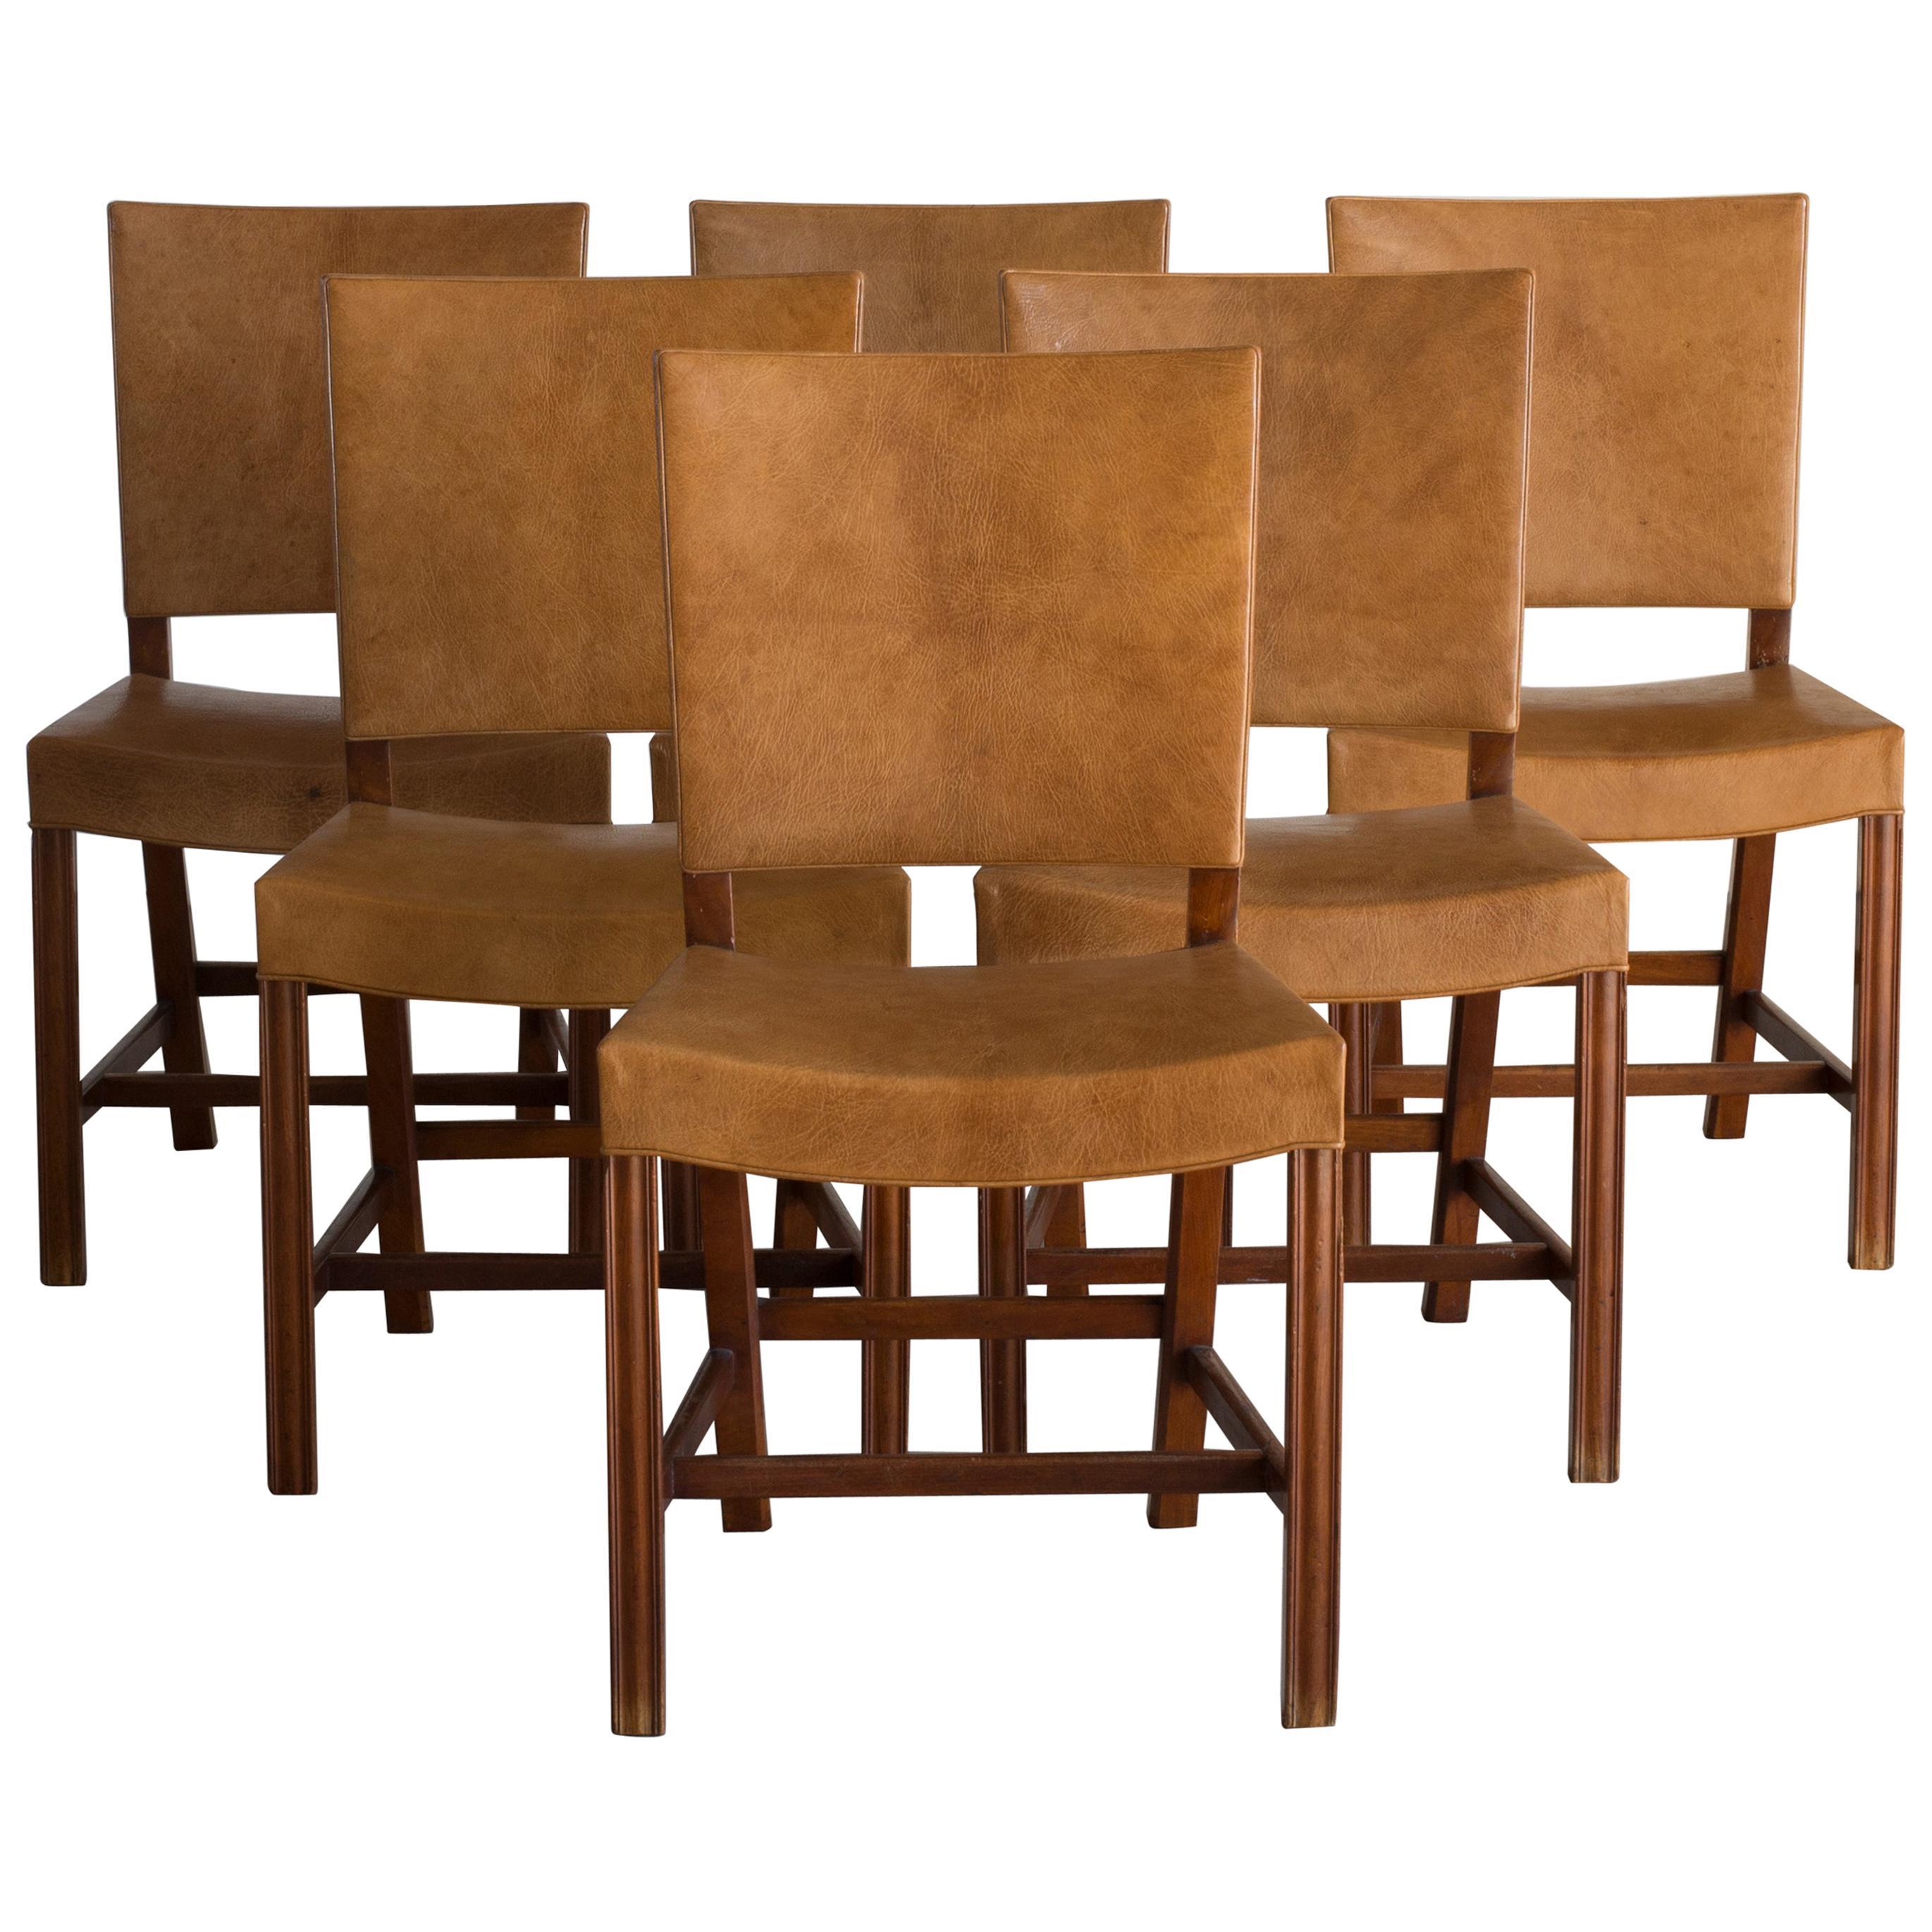 Kaare Klint Set of Six Red Chairs for Rud. Rasmussen